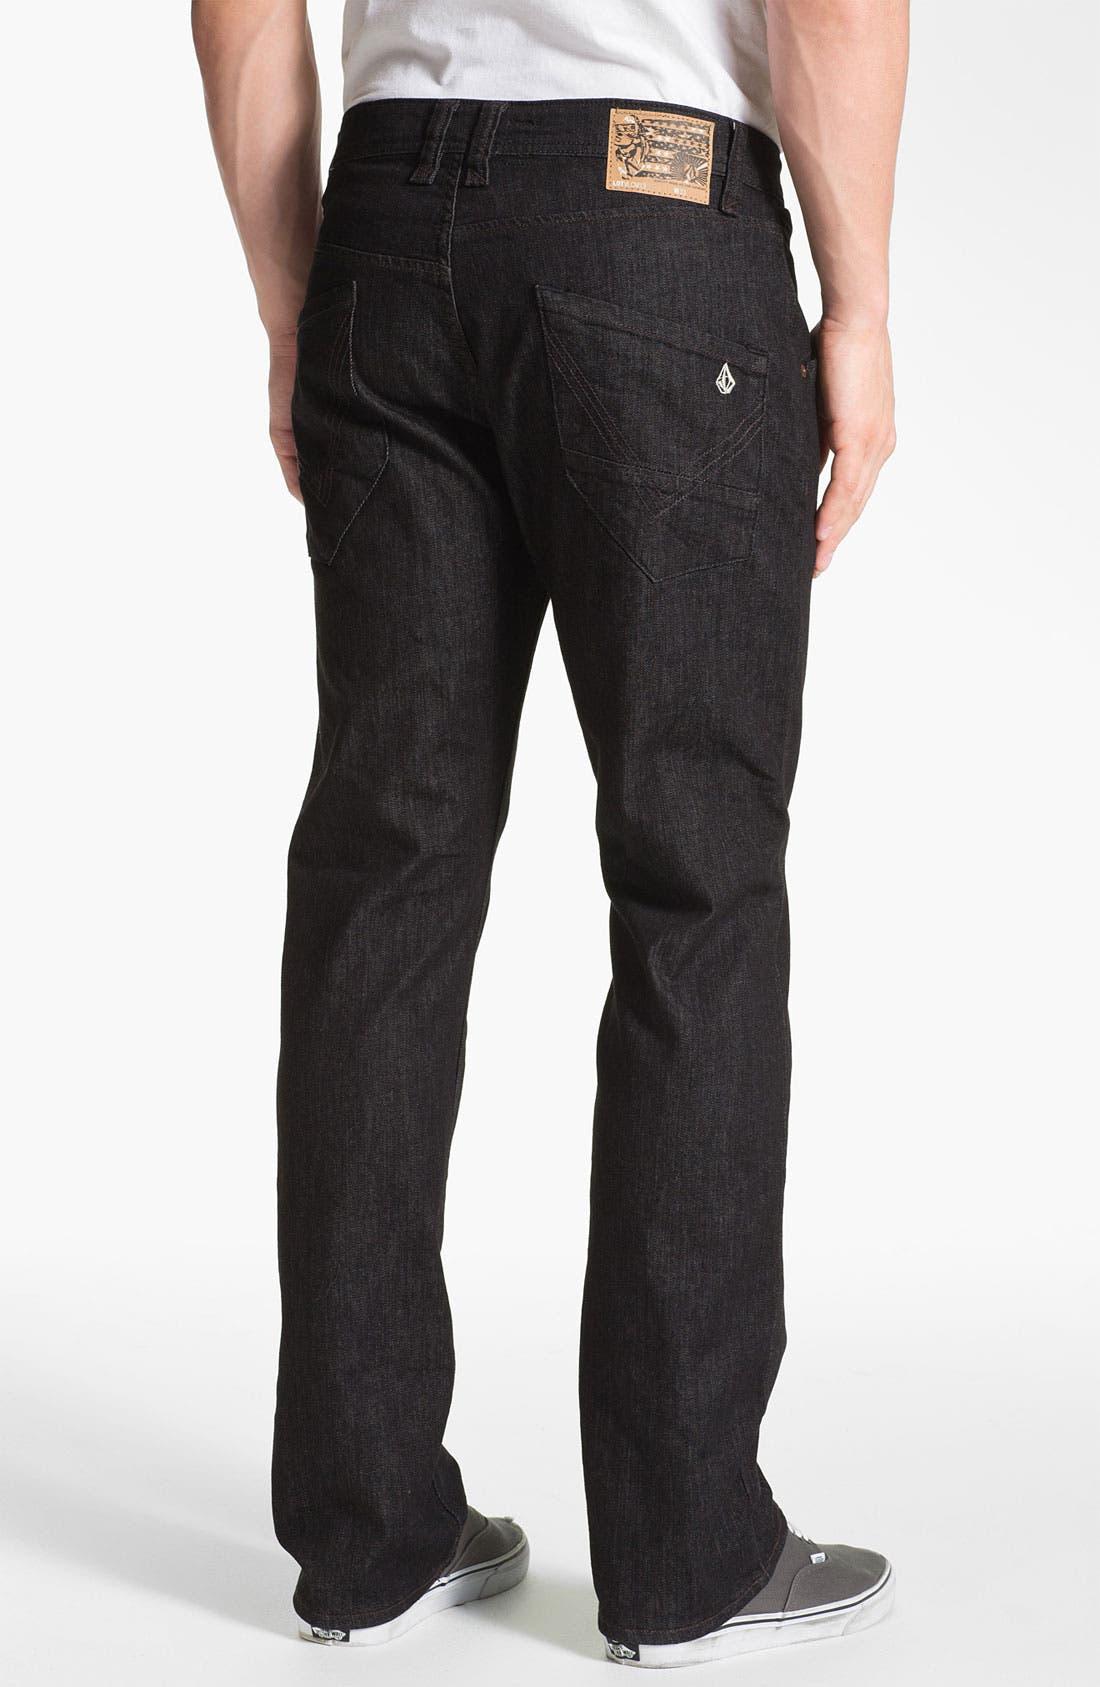 VOLCOM,                             'Nova' Slim Straight Leg Jeans,                             Main thumbnail 1, color,                             001